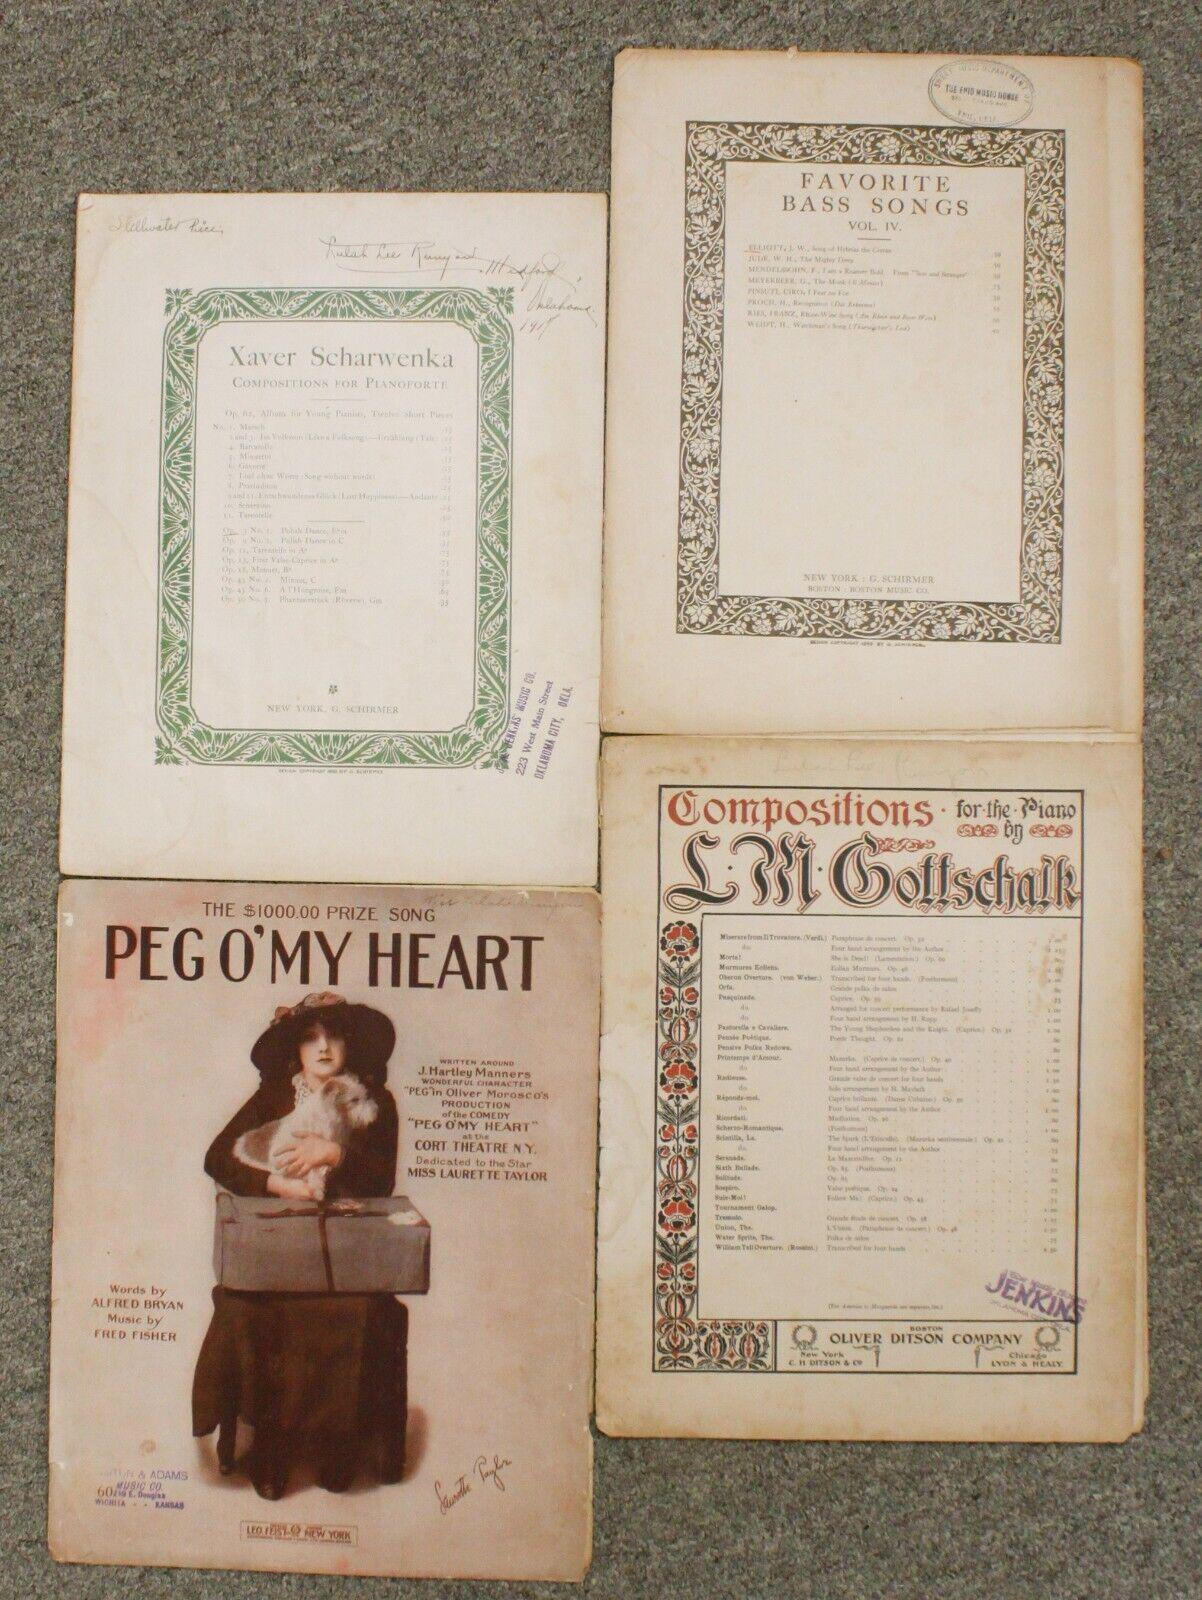 Xaver Scharwenka Boston Pego My Heart Gottschalk Piano Sheet Music Mixed Lot - $14.95